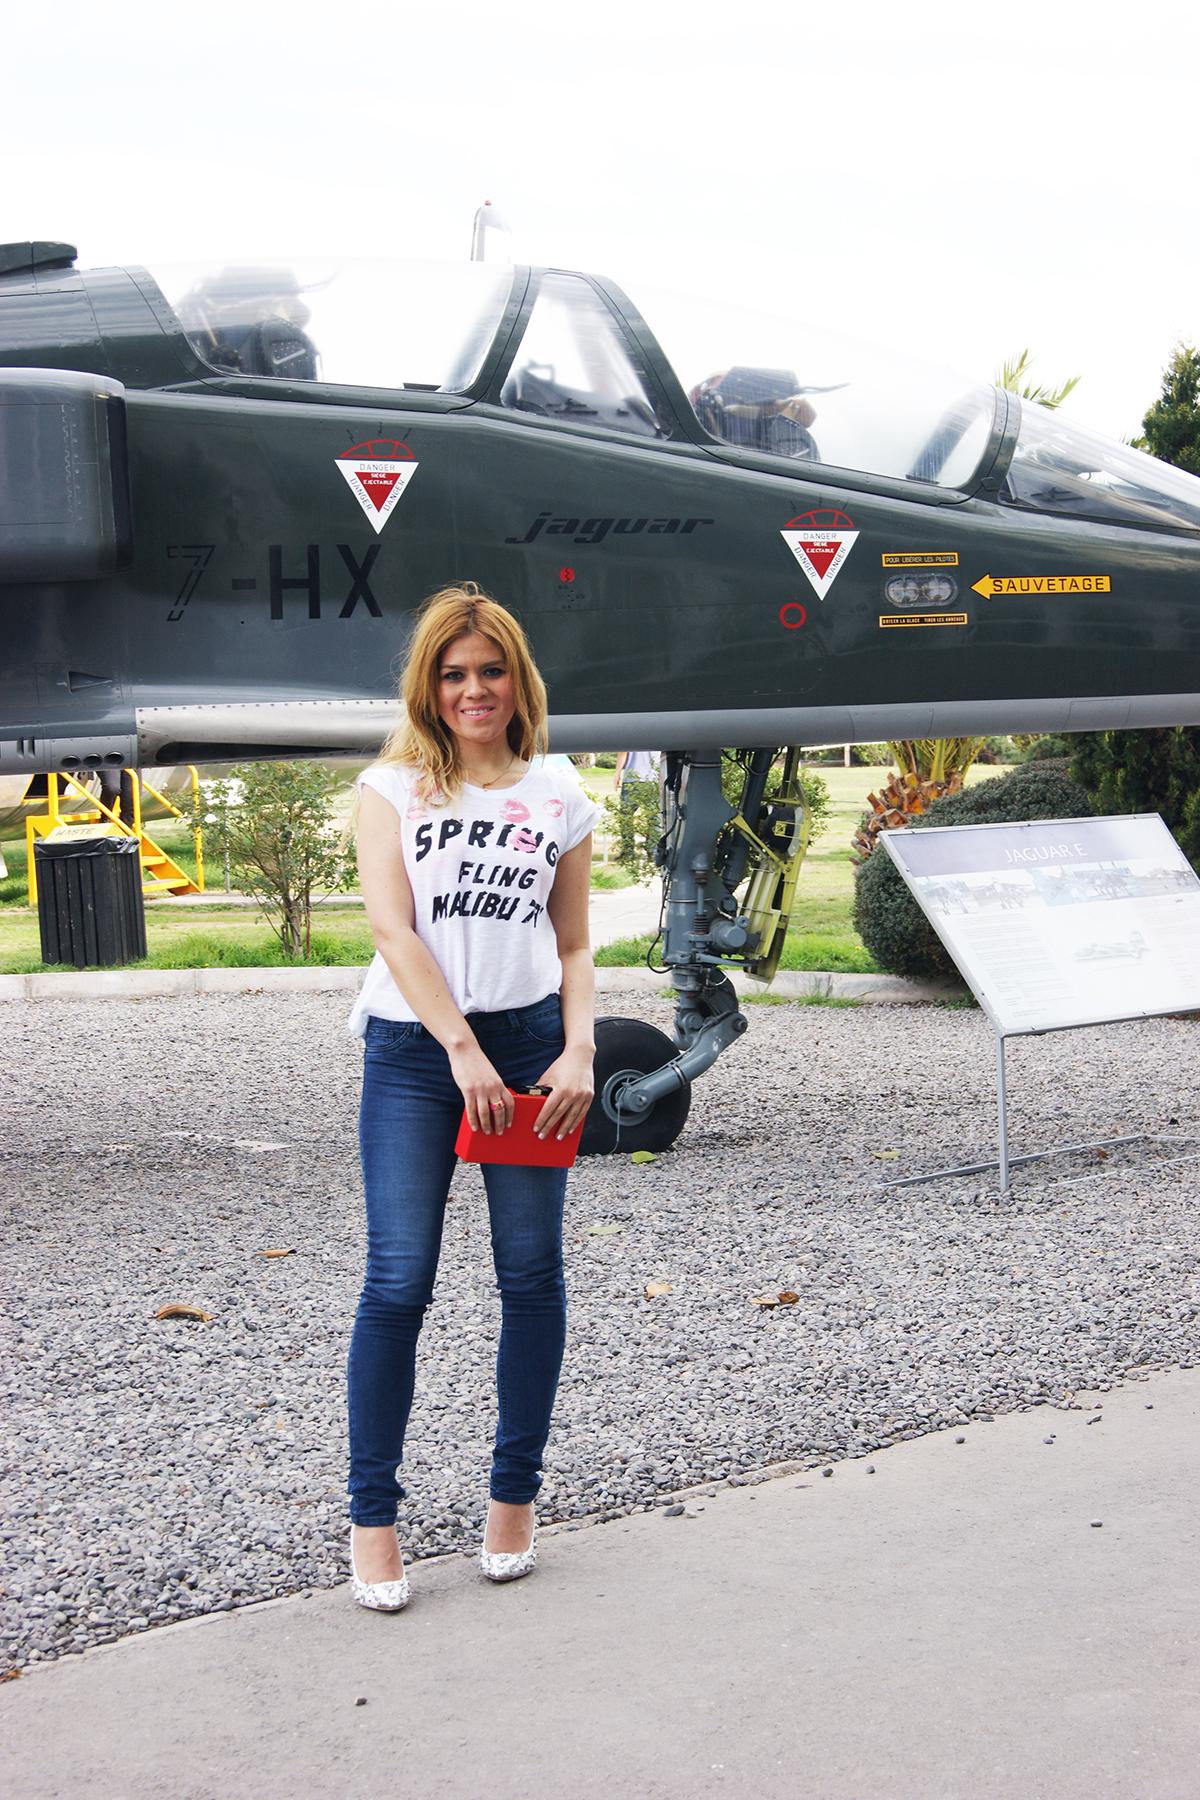 Spring flying Malibu  Aeronautics Museum